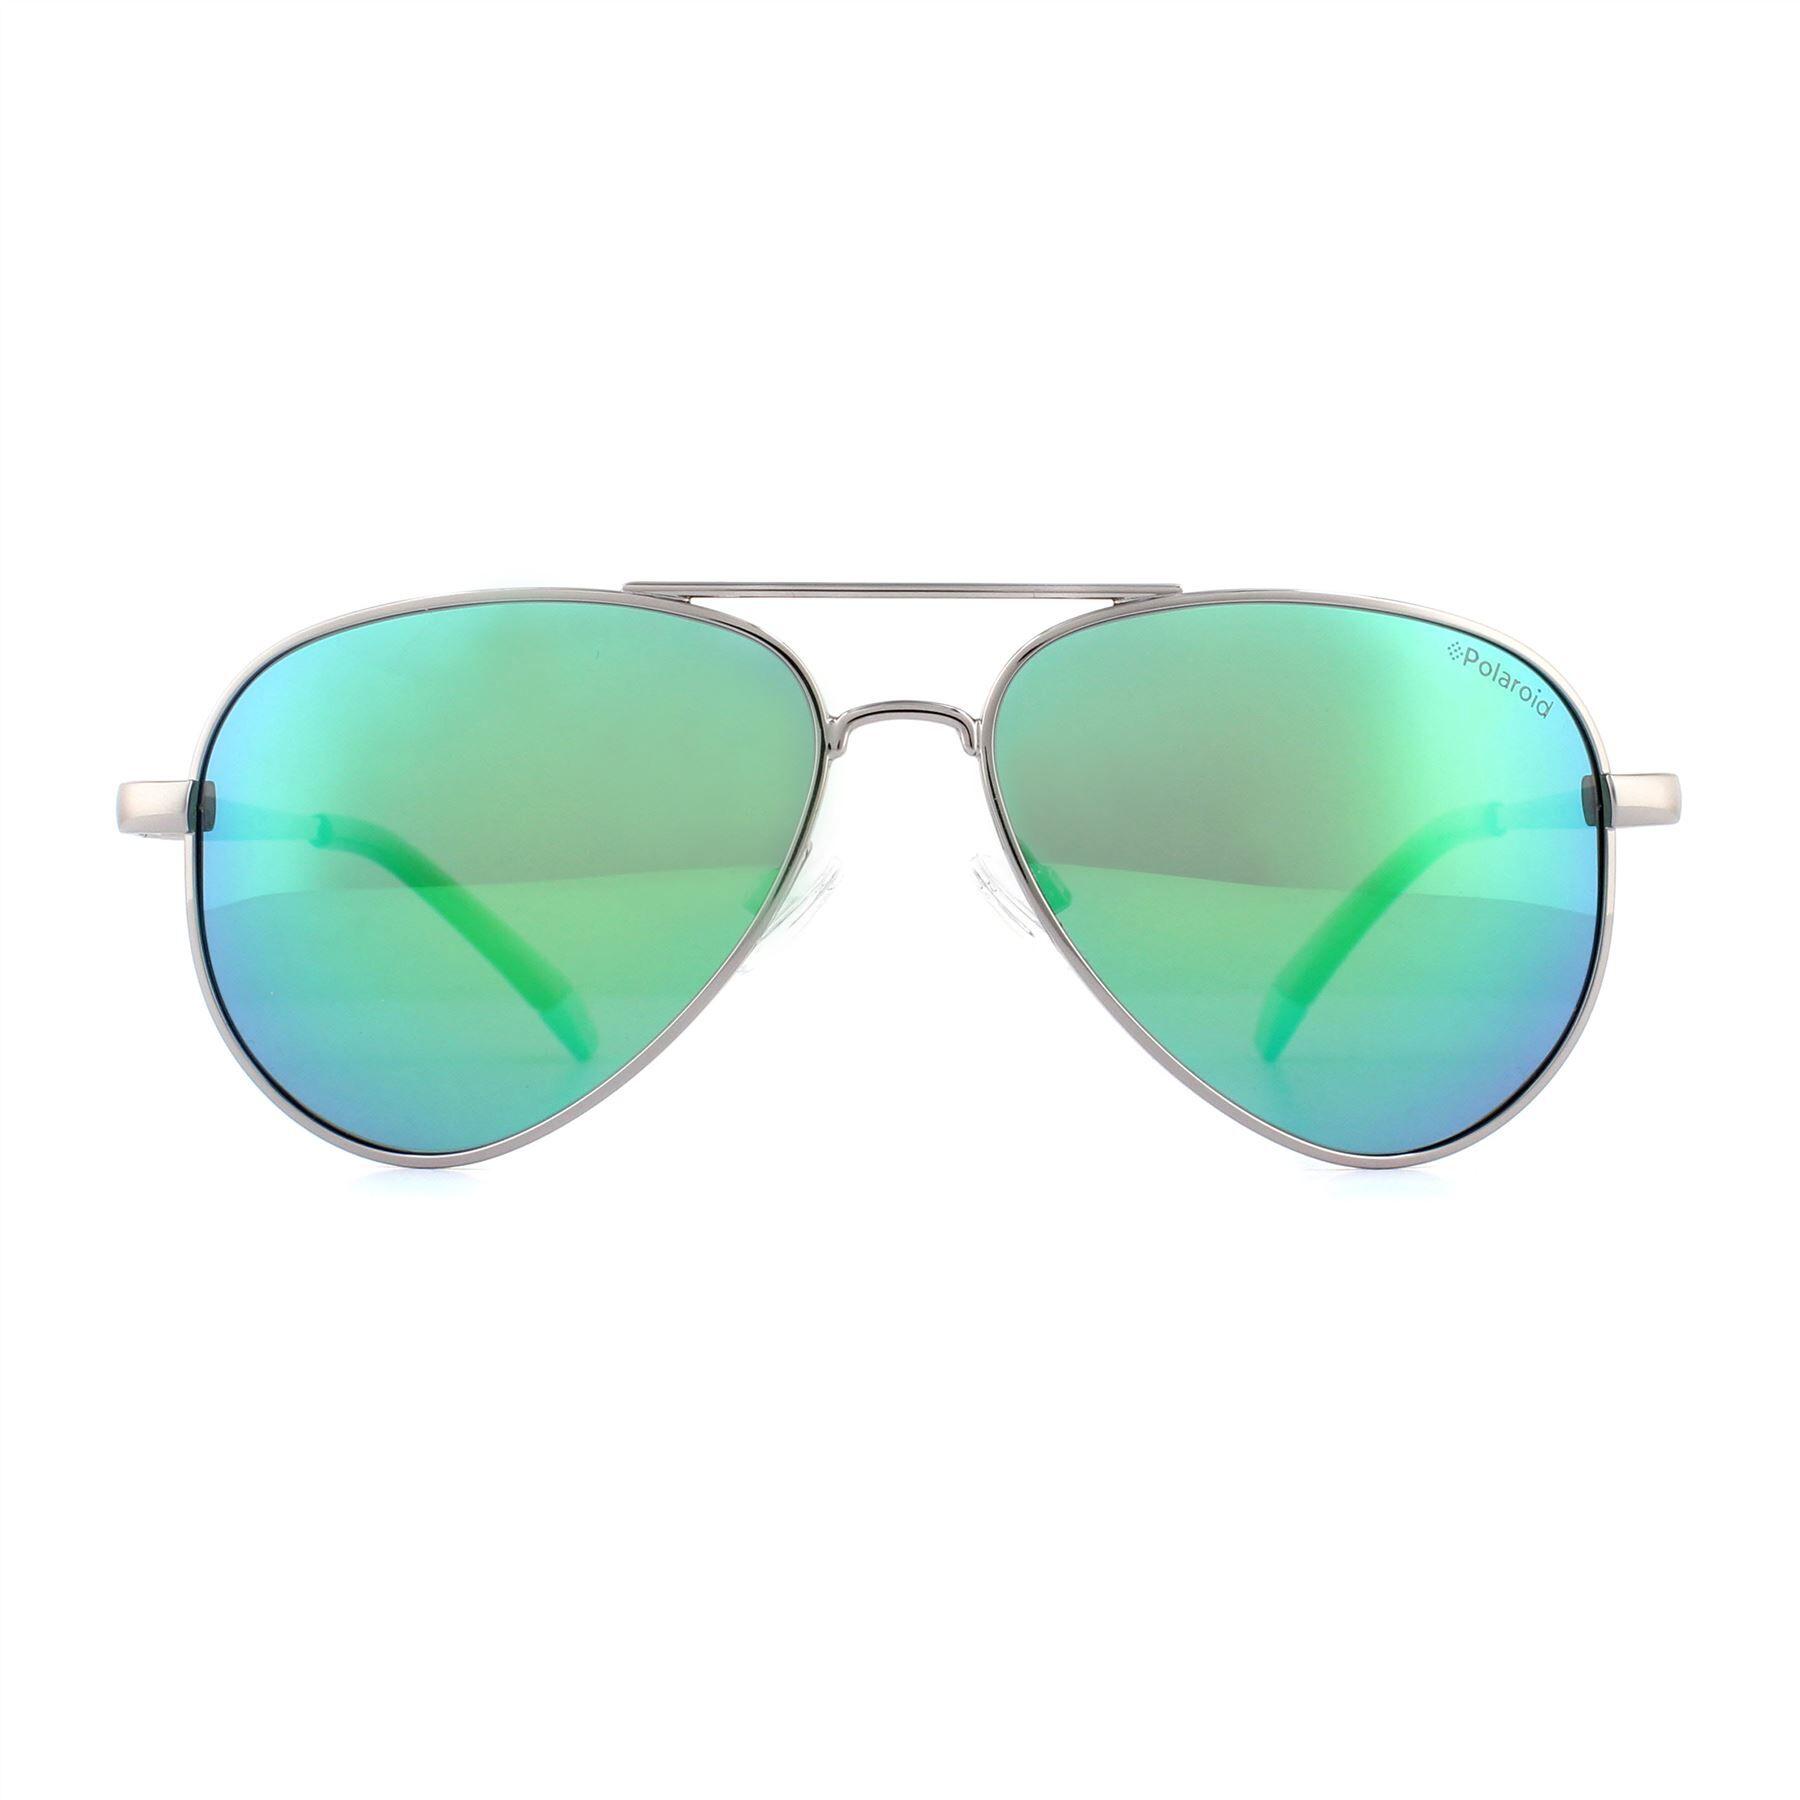 Polaroid Kids Sunglasses 8015/N/NEW 6LB 5Z Ruthenium Green Mirror Polarized